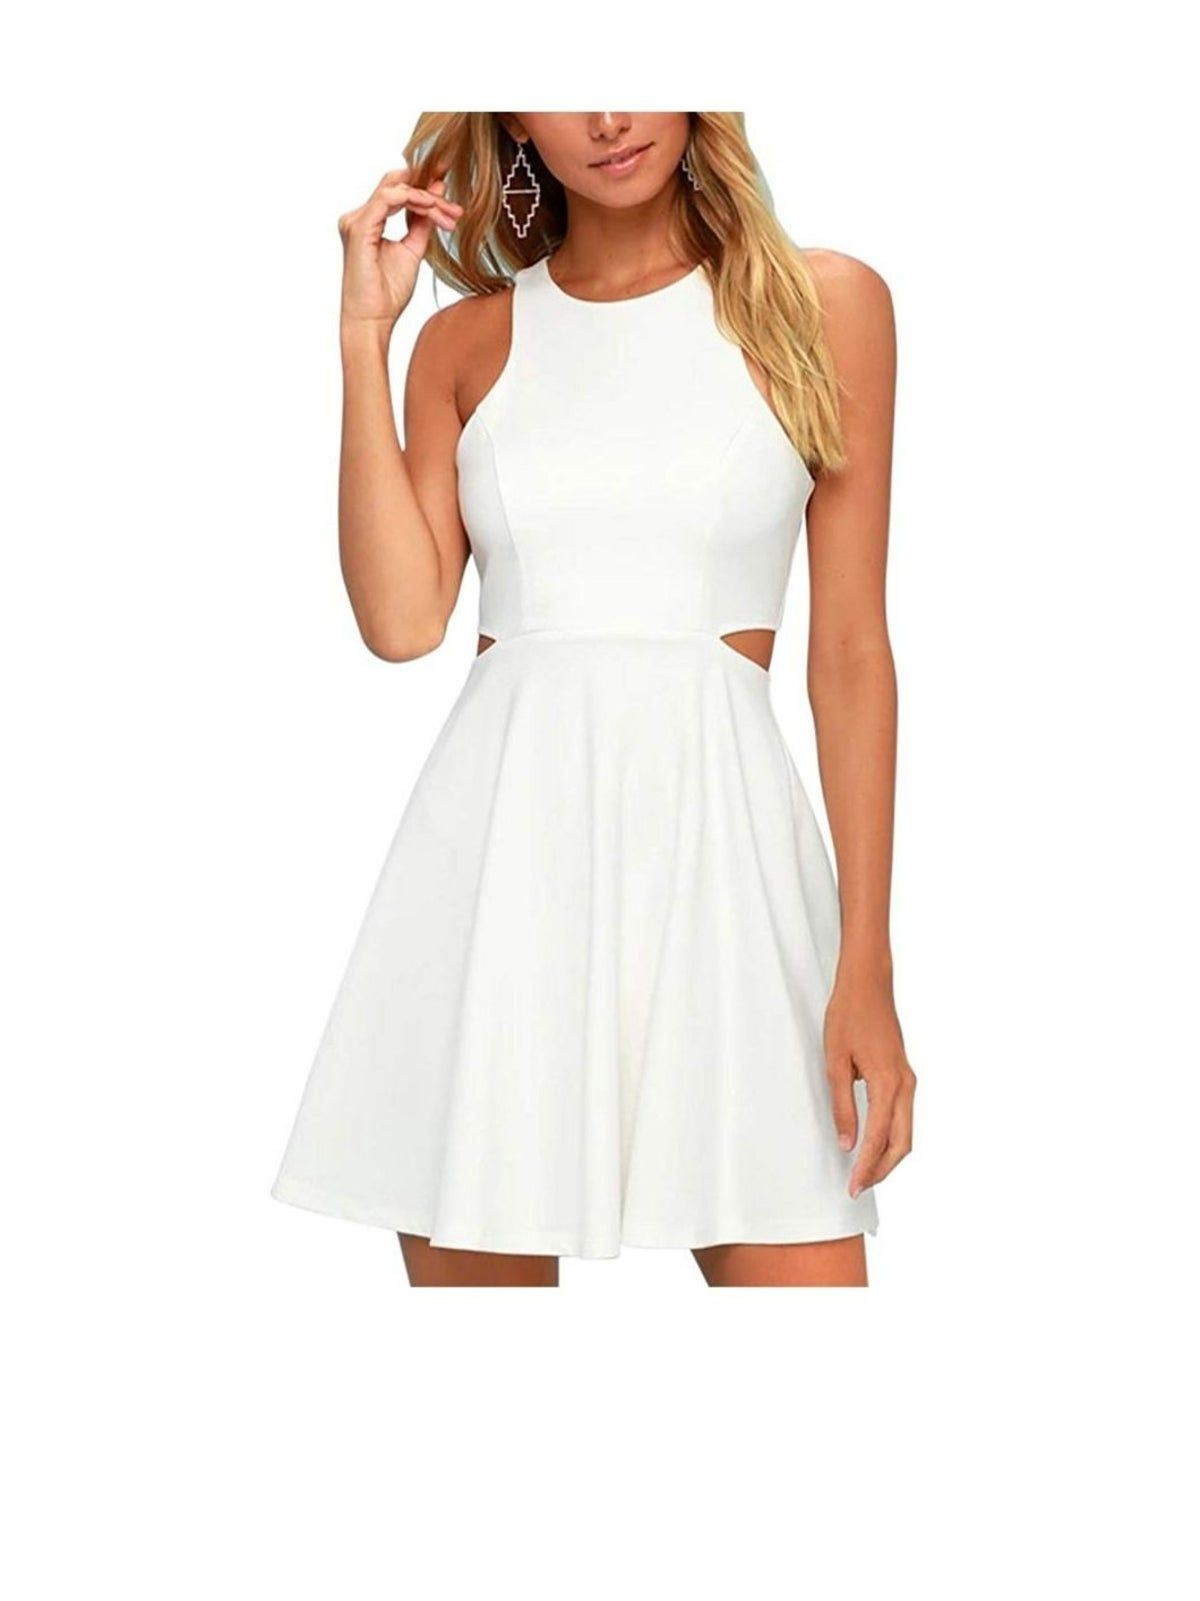 White Dress Dresses 8th Grade Graduation Dresses White Graduation Dress For 8th Grade [ 1601 x 1200 Pixel ]